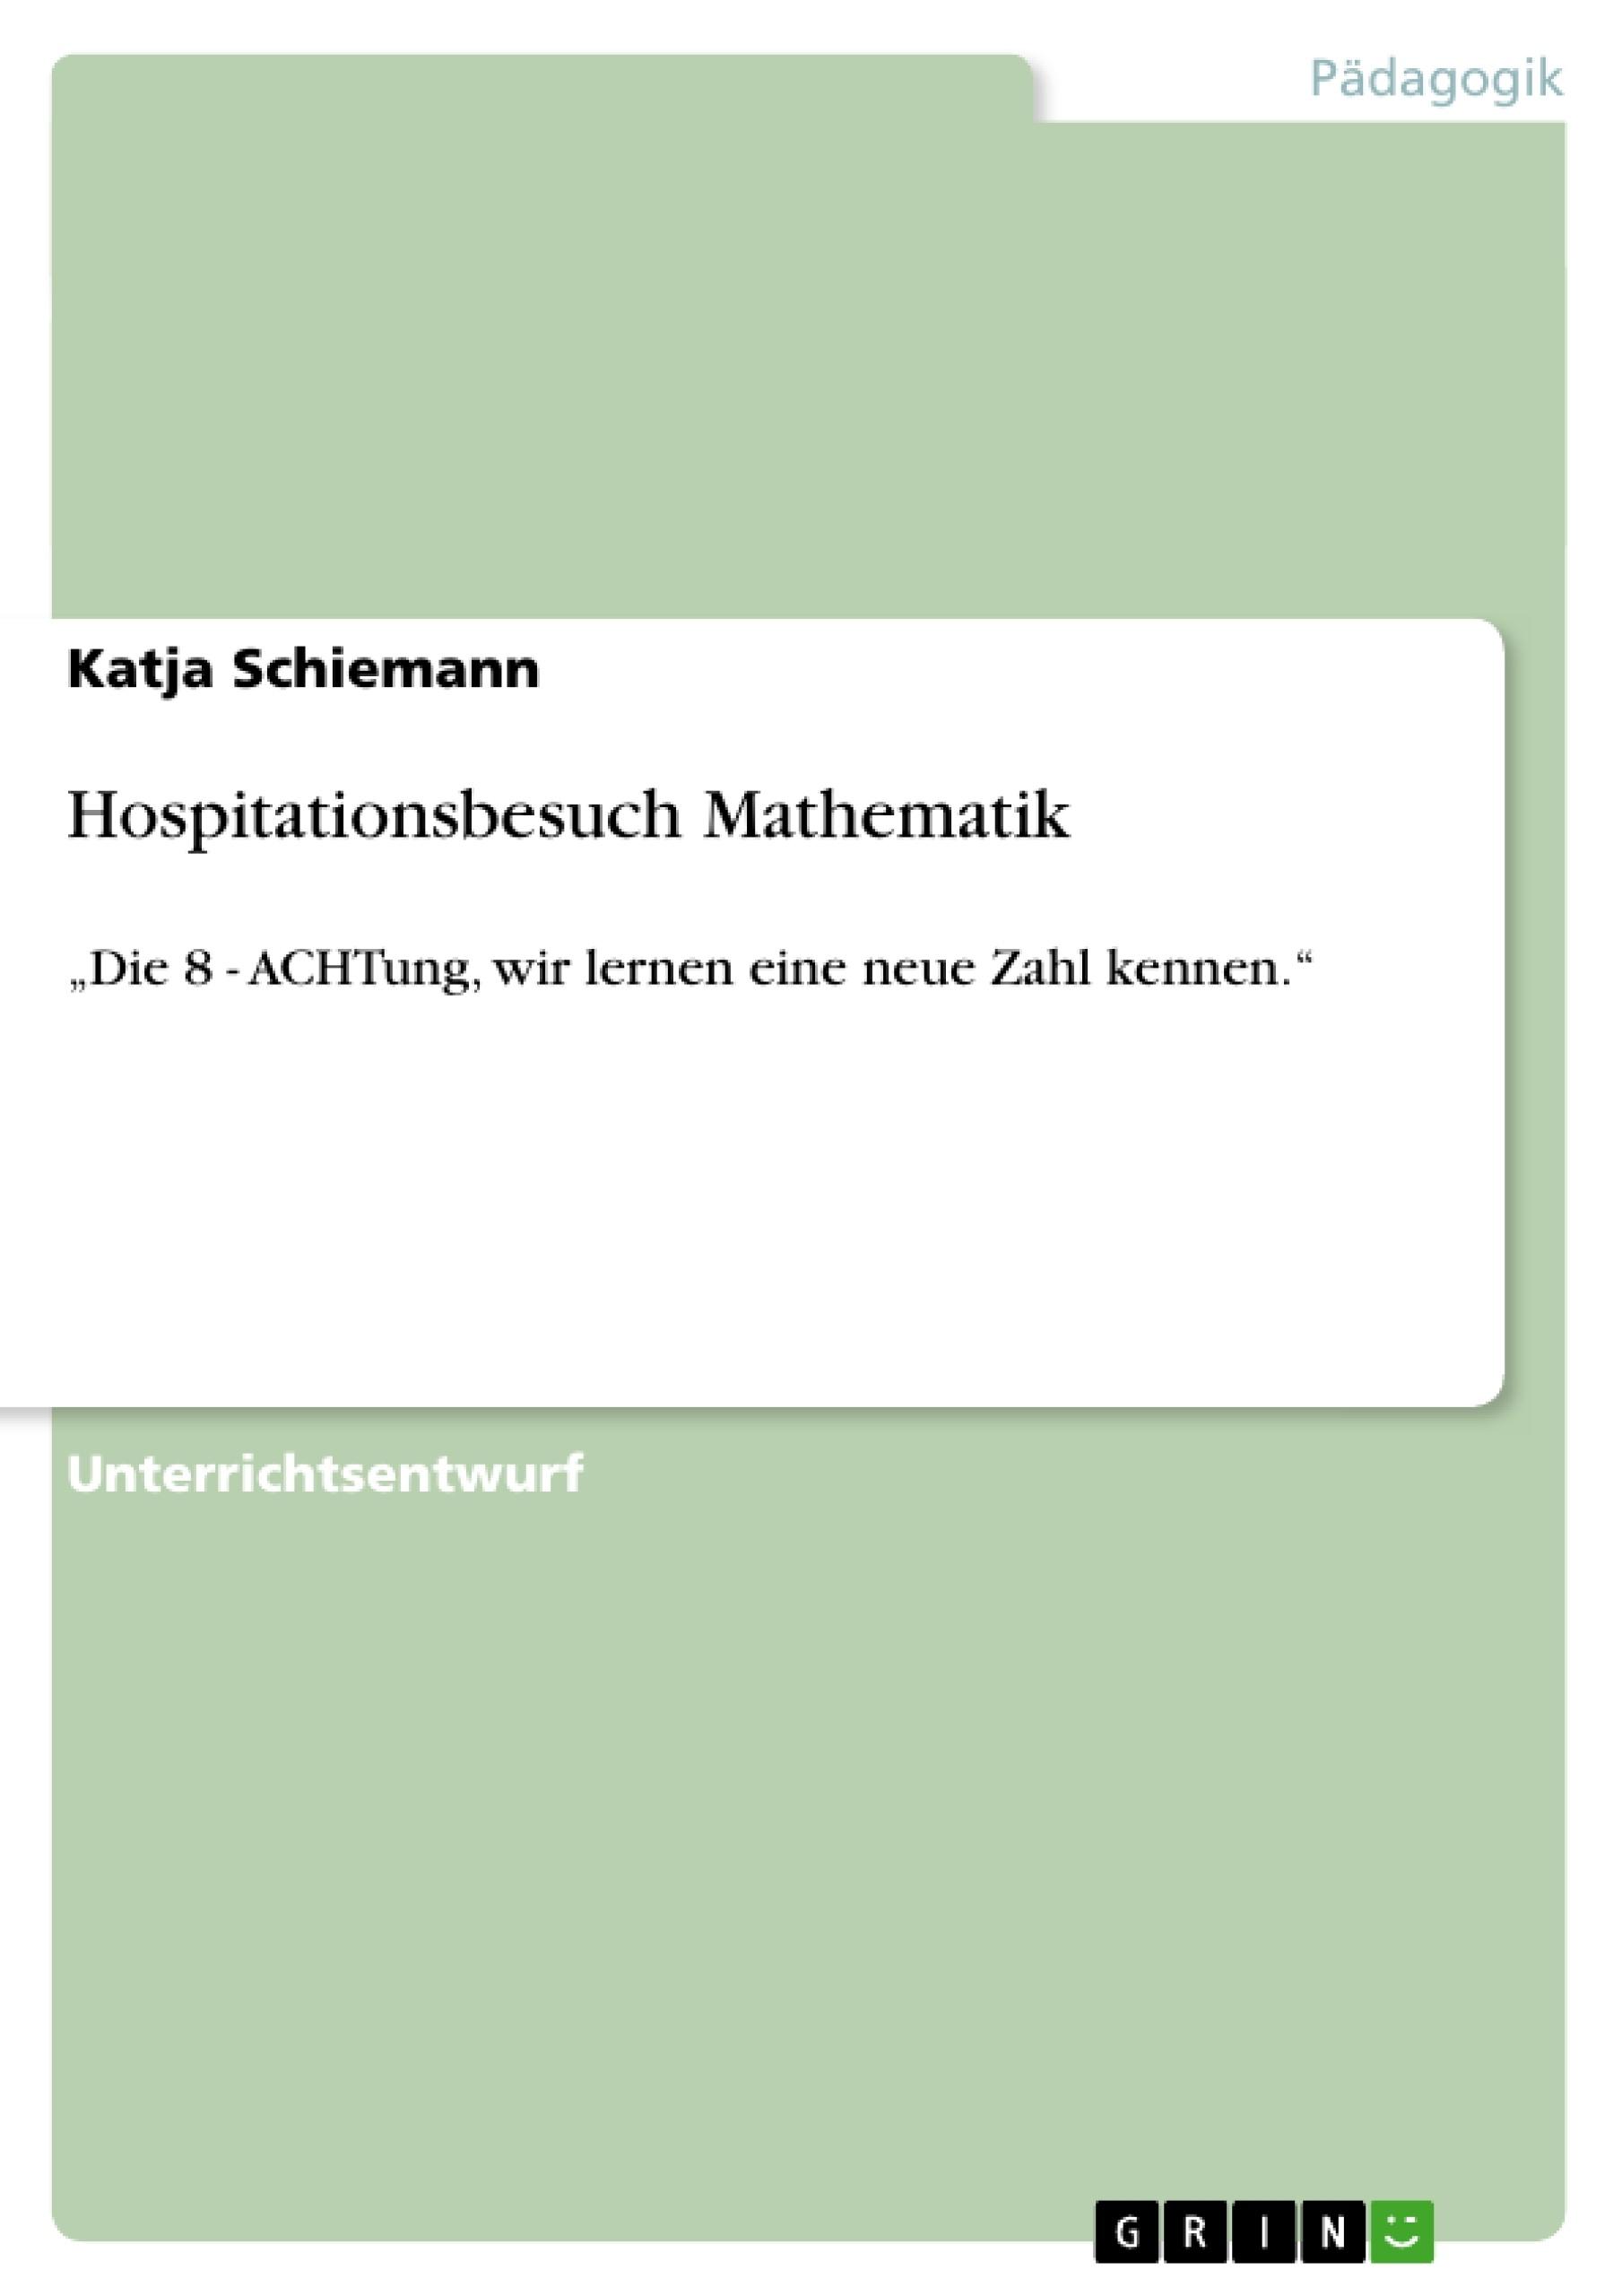 Titel: Hospitationsbesuch Mathematik